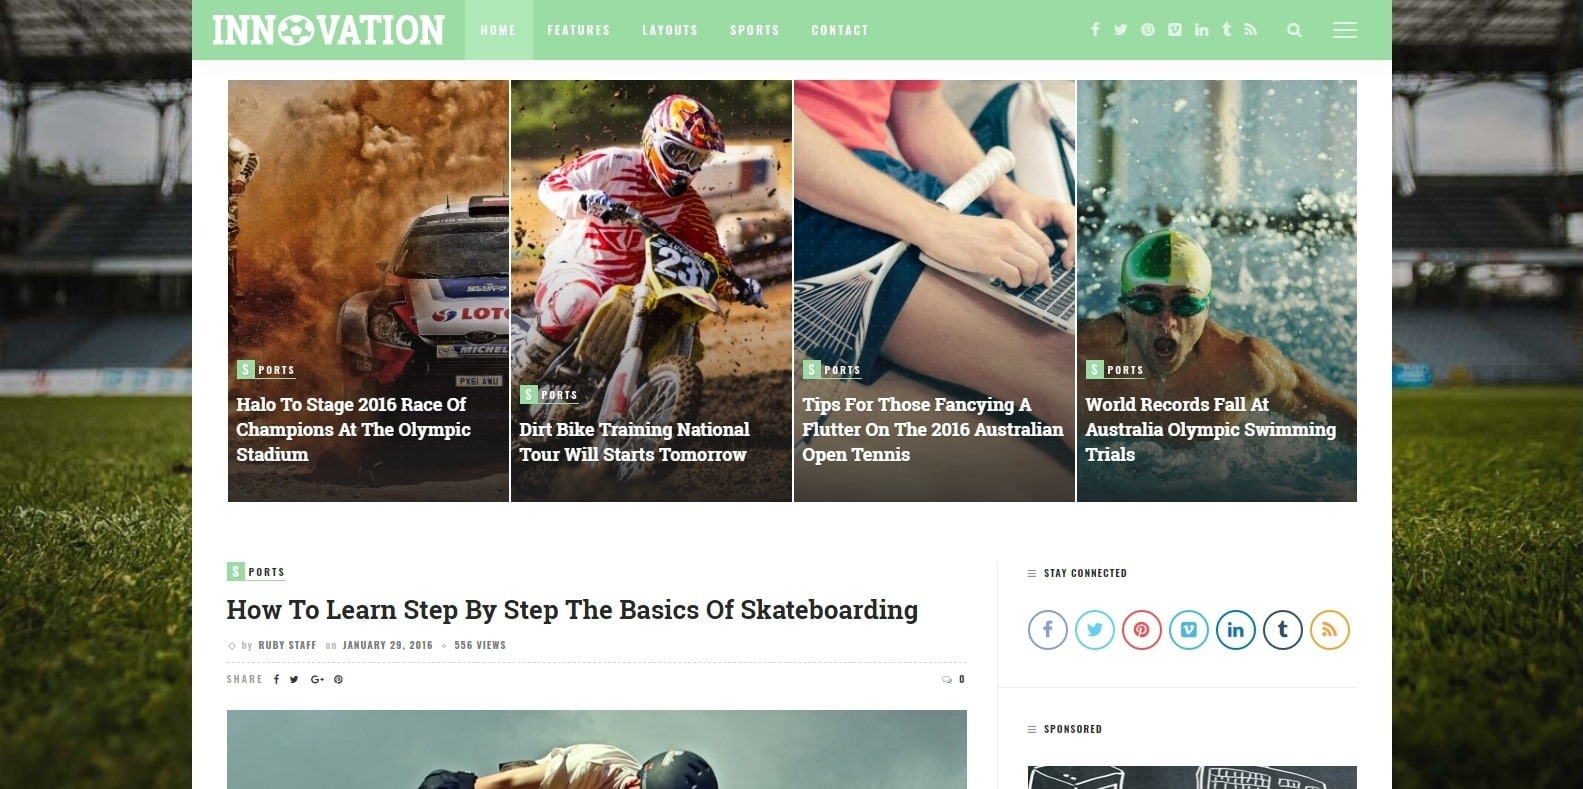 innovation-sports-website-template